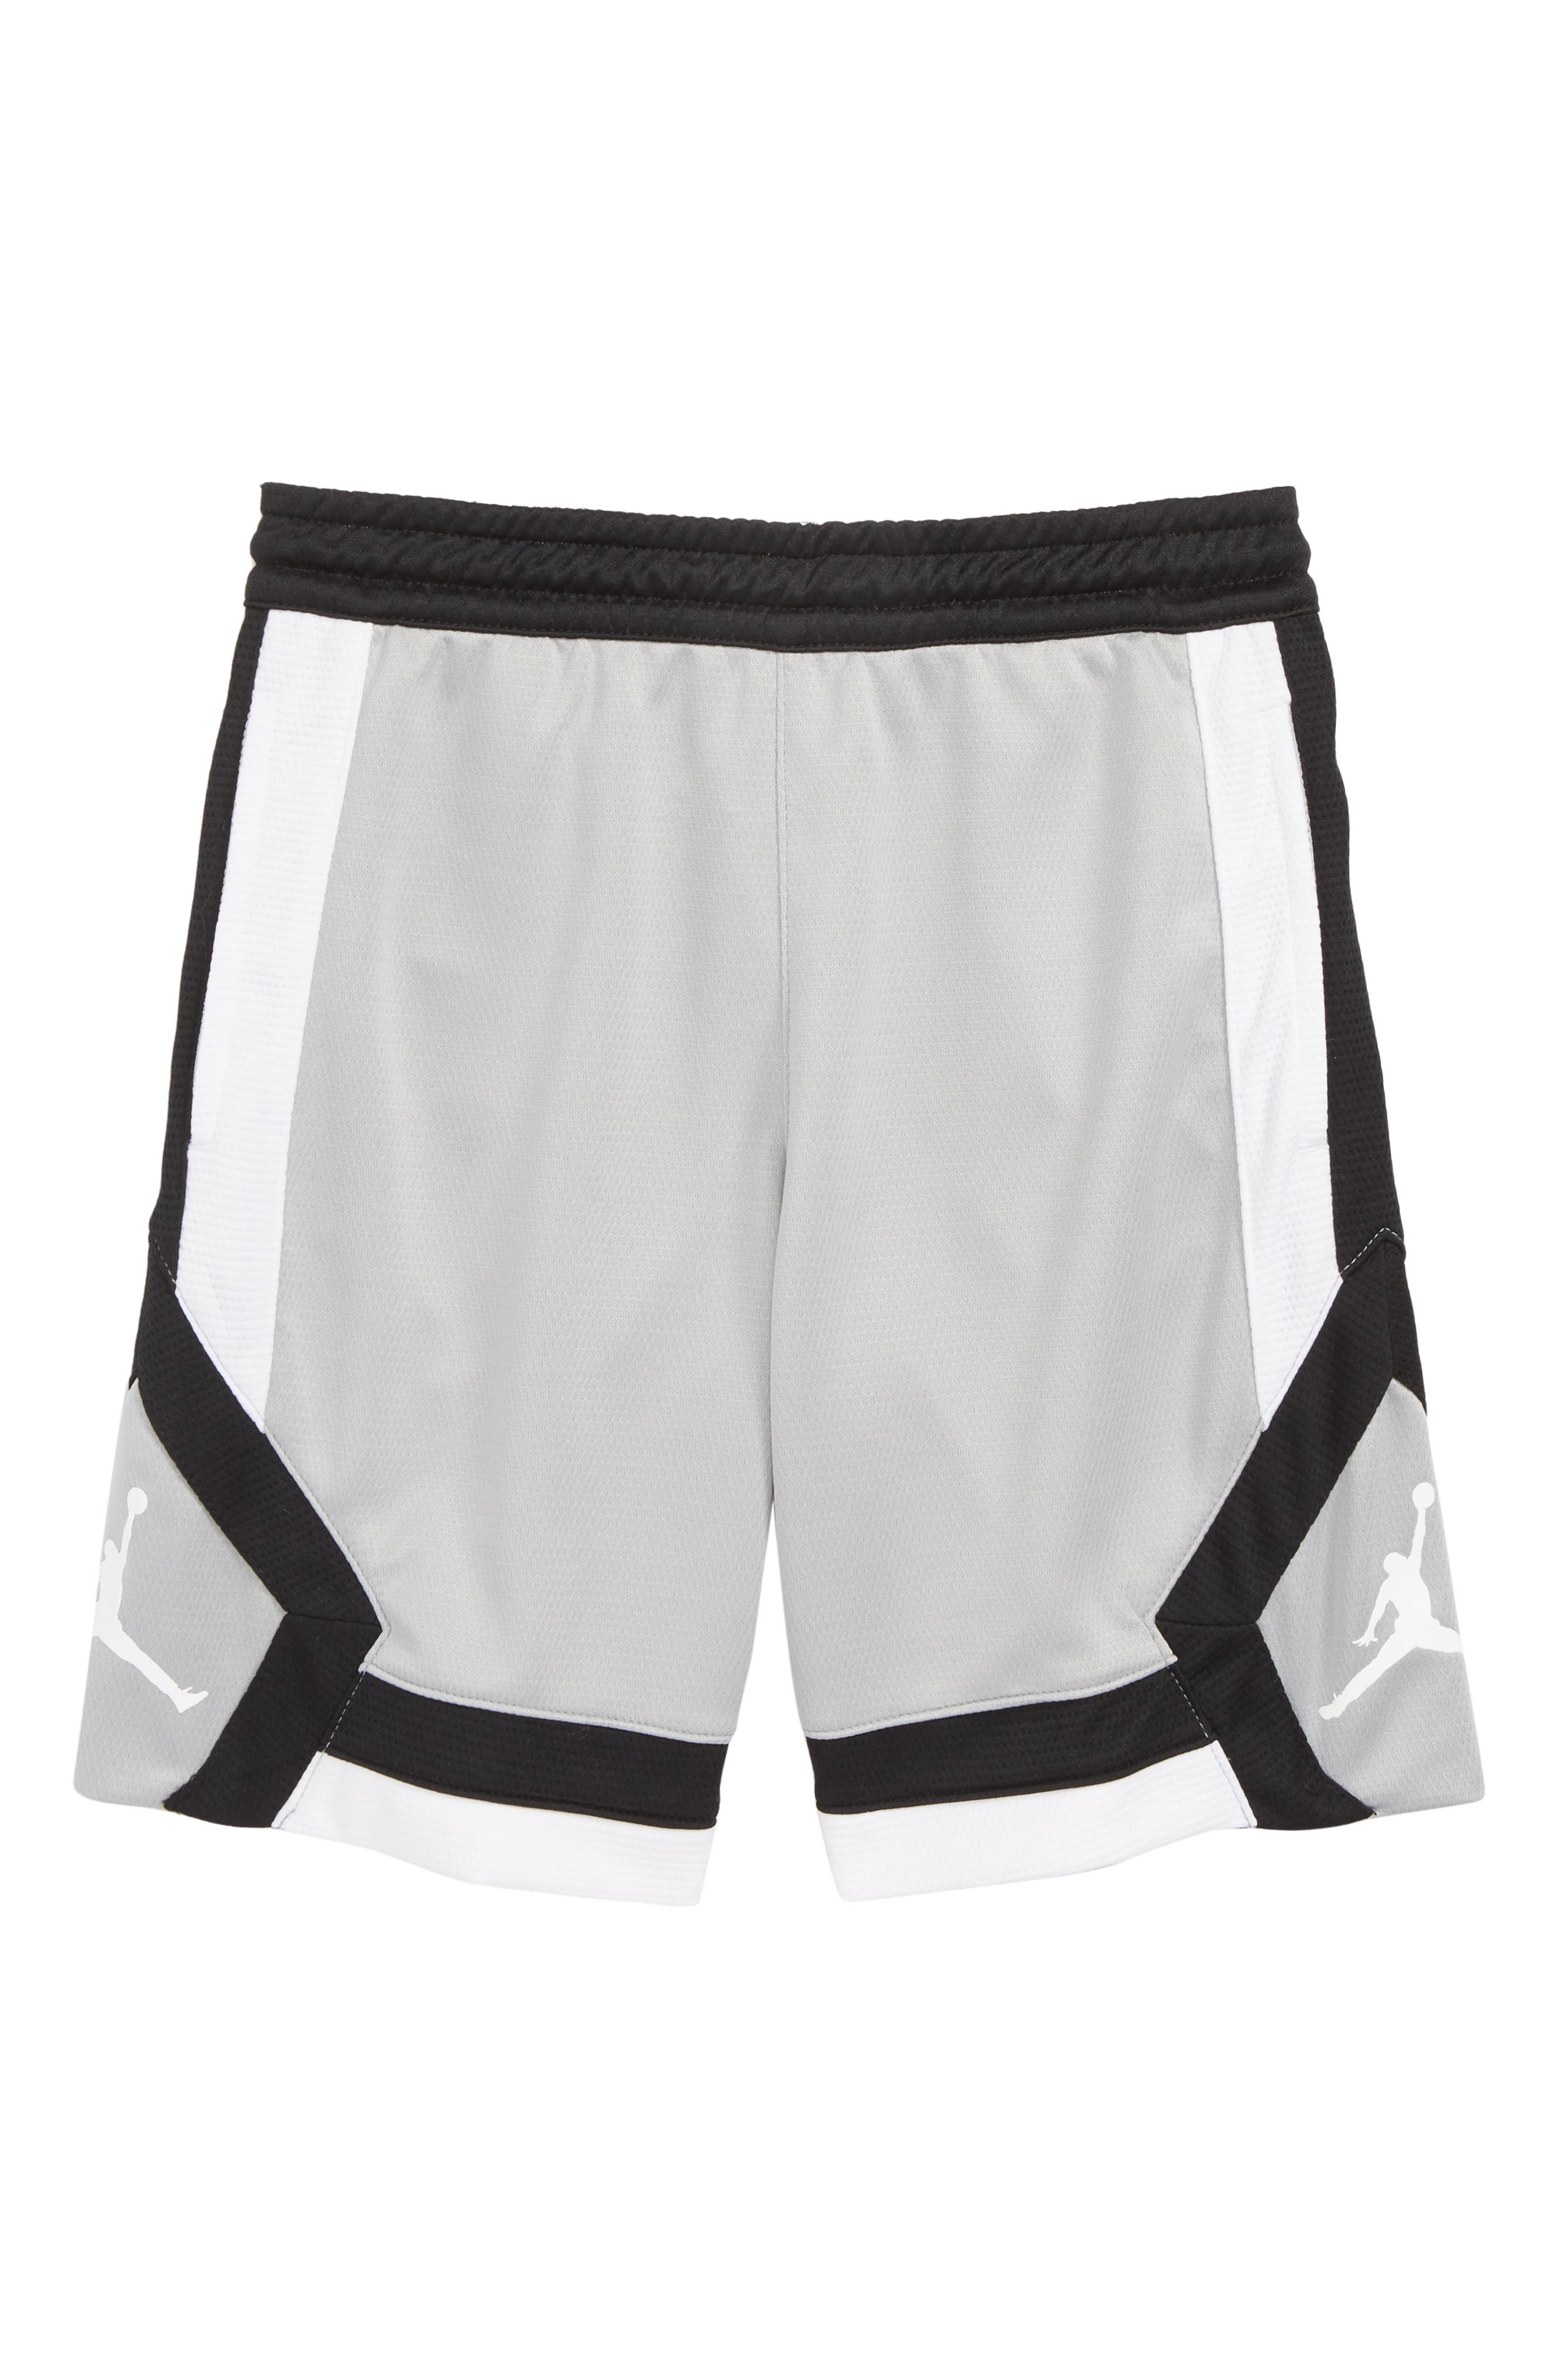 Jordan Rise Athletic Shorts,                             Main thumbnail 1, color,                             LIGHT SMOKE GREY